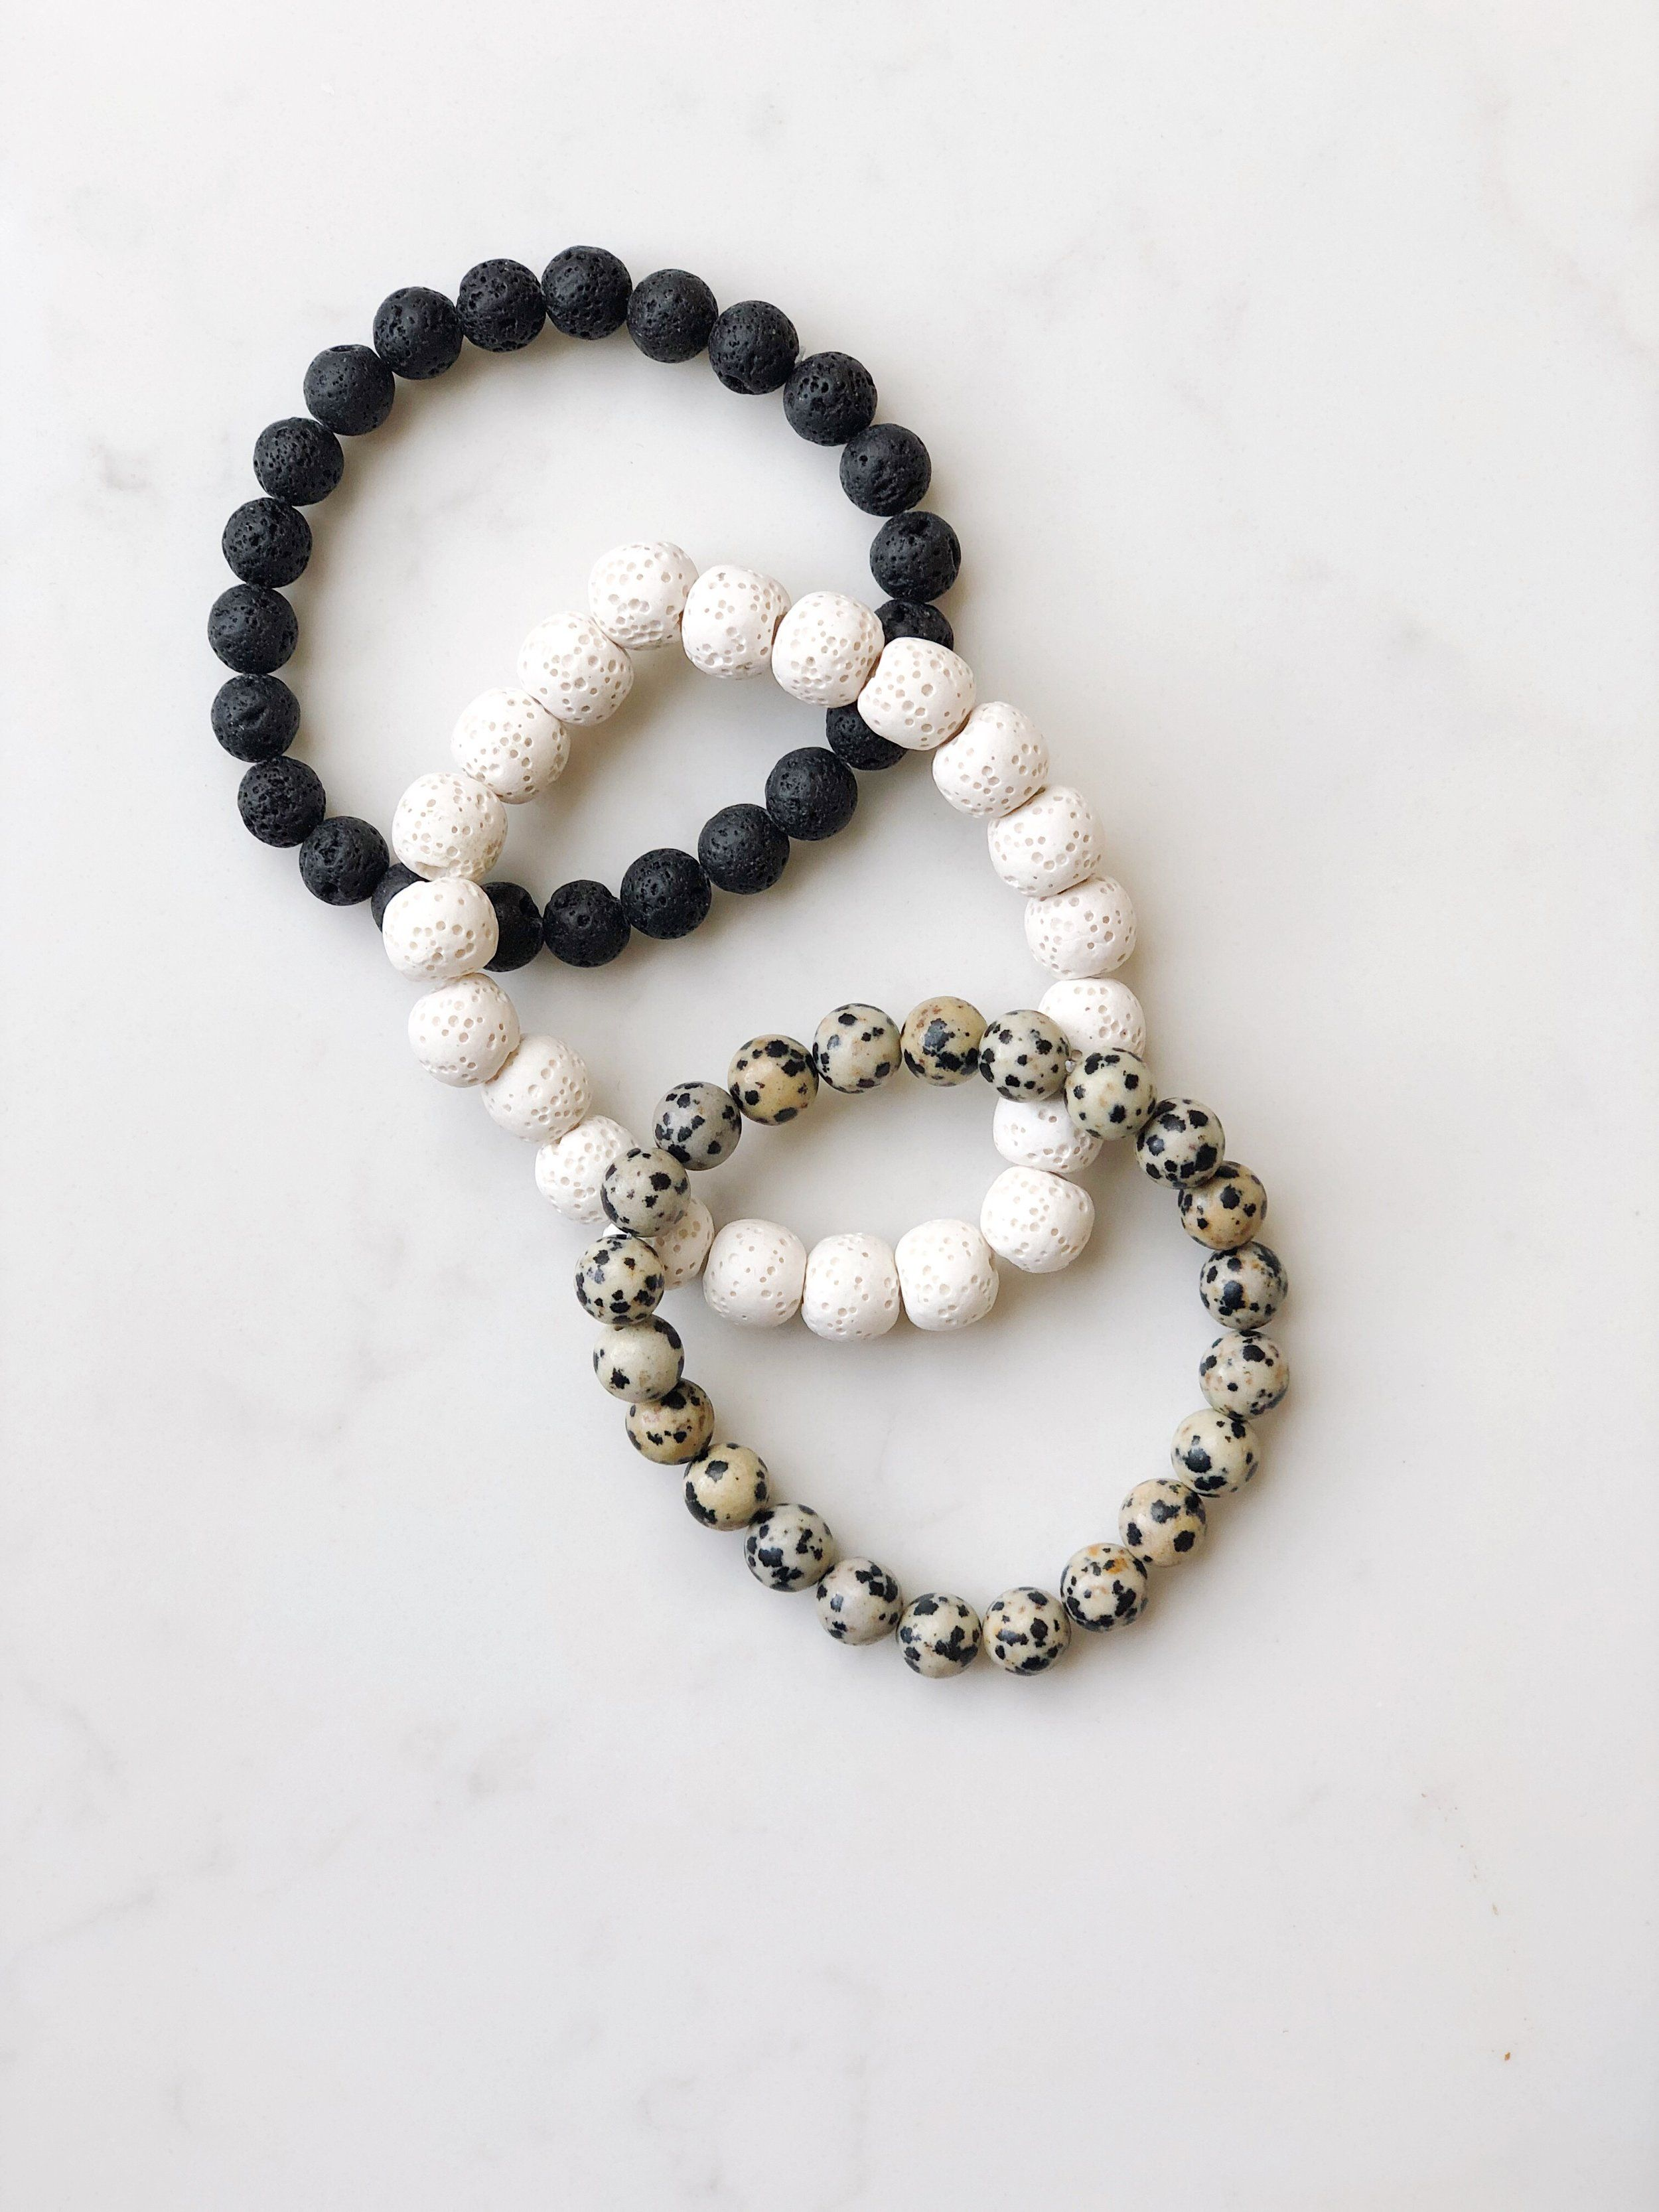 Siver Pearl Diffuser BraceletNecklace Combo